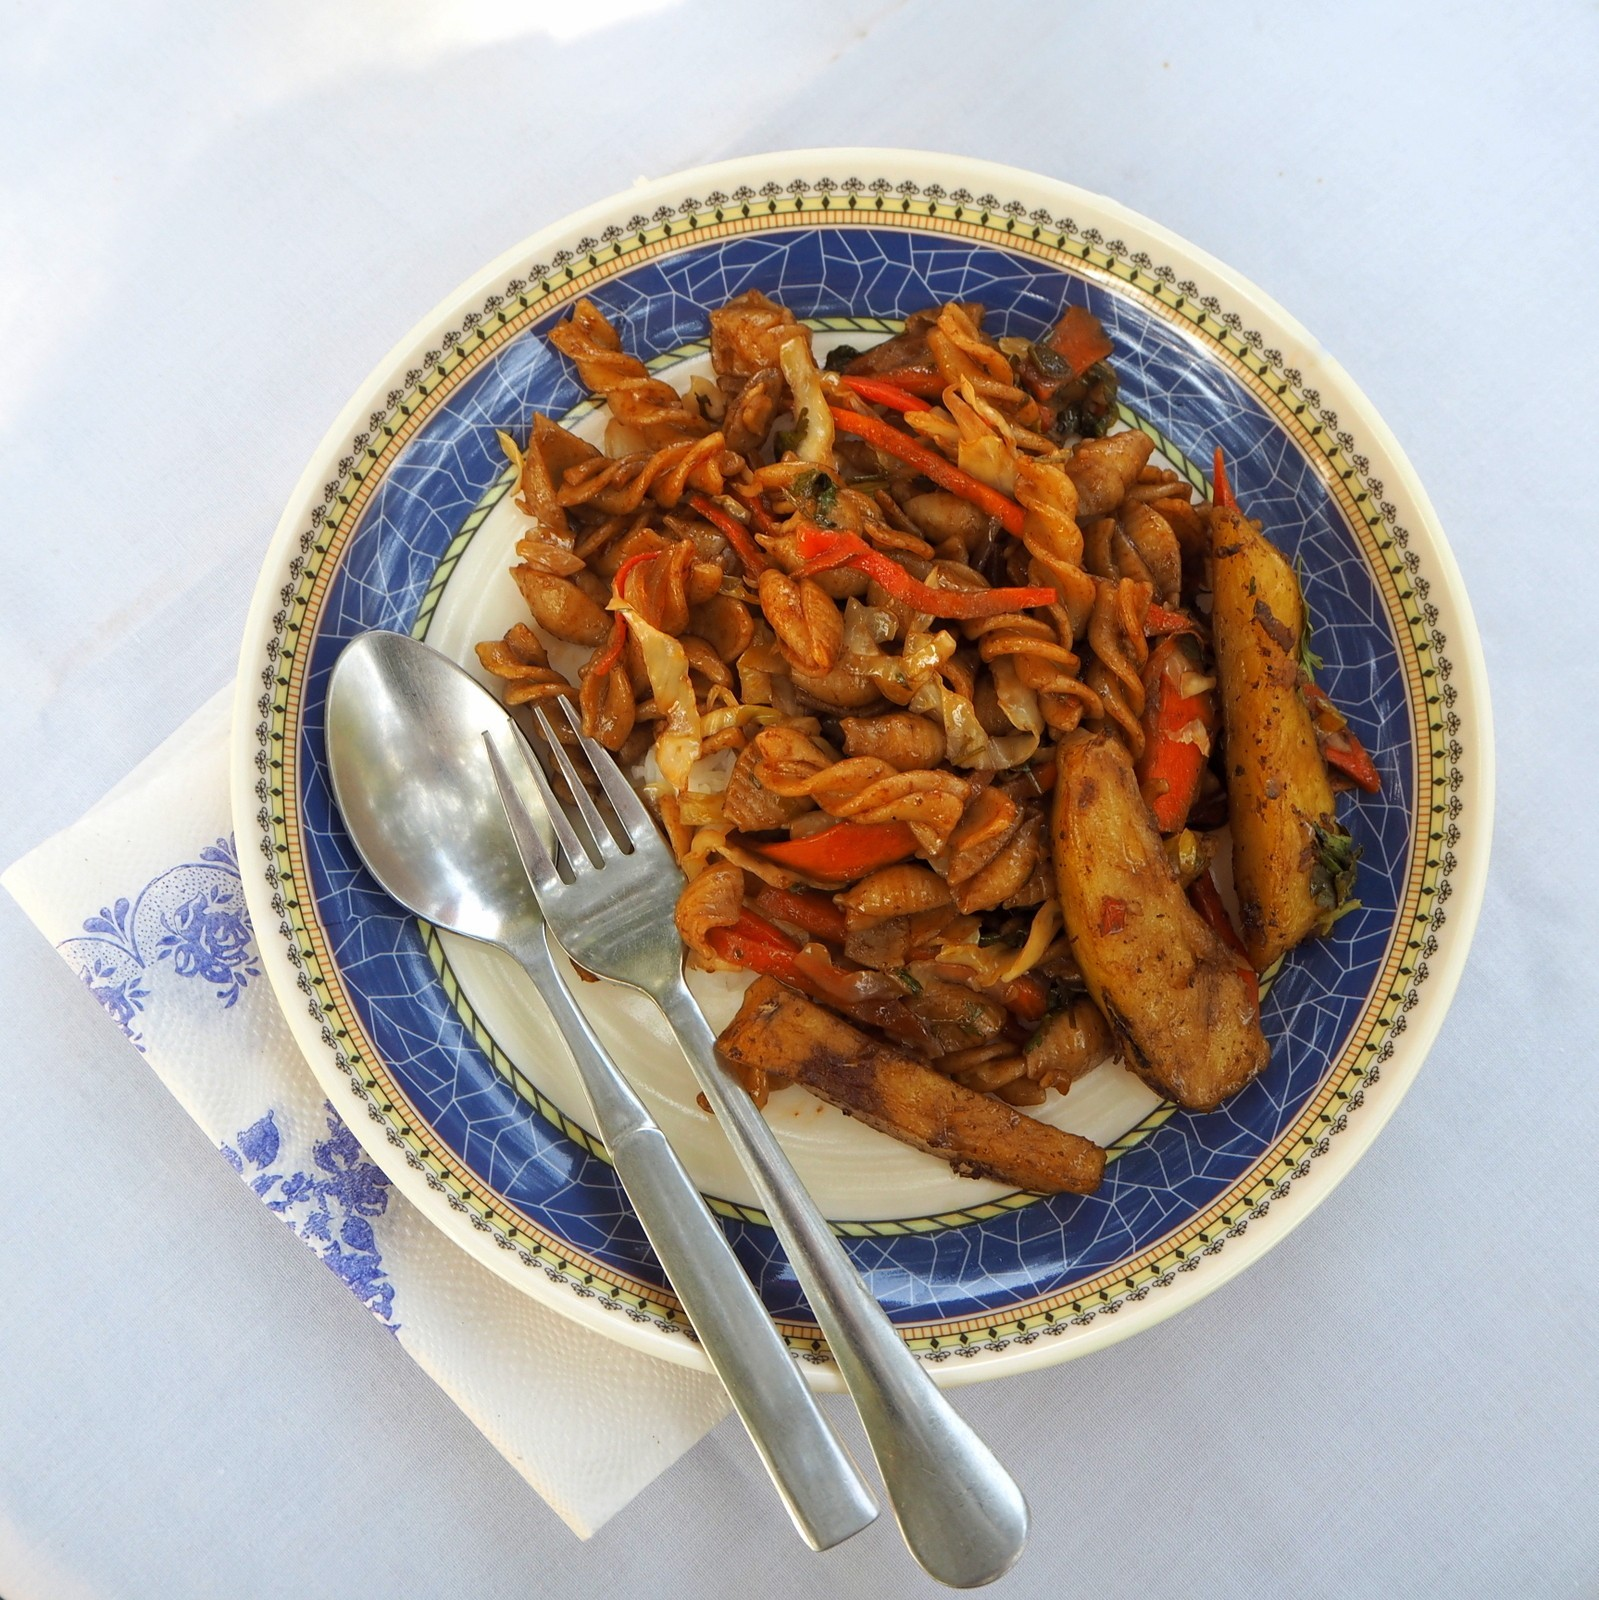 Lunch Bhutan